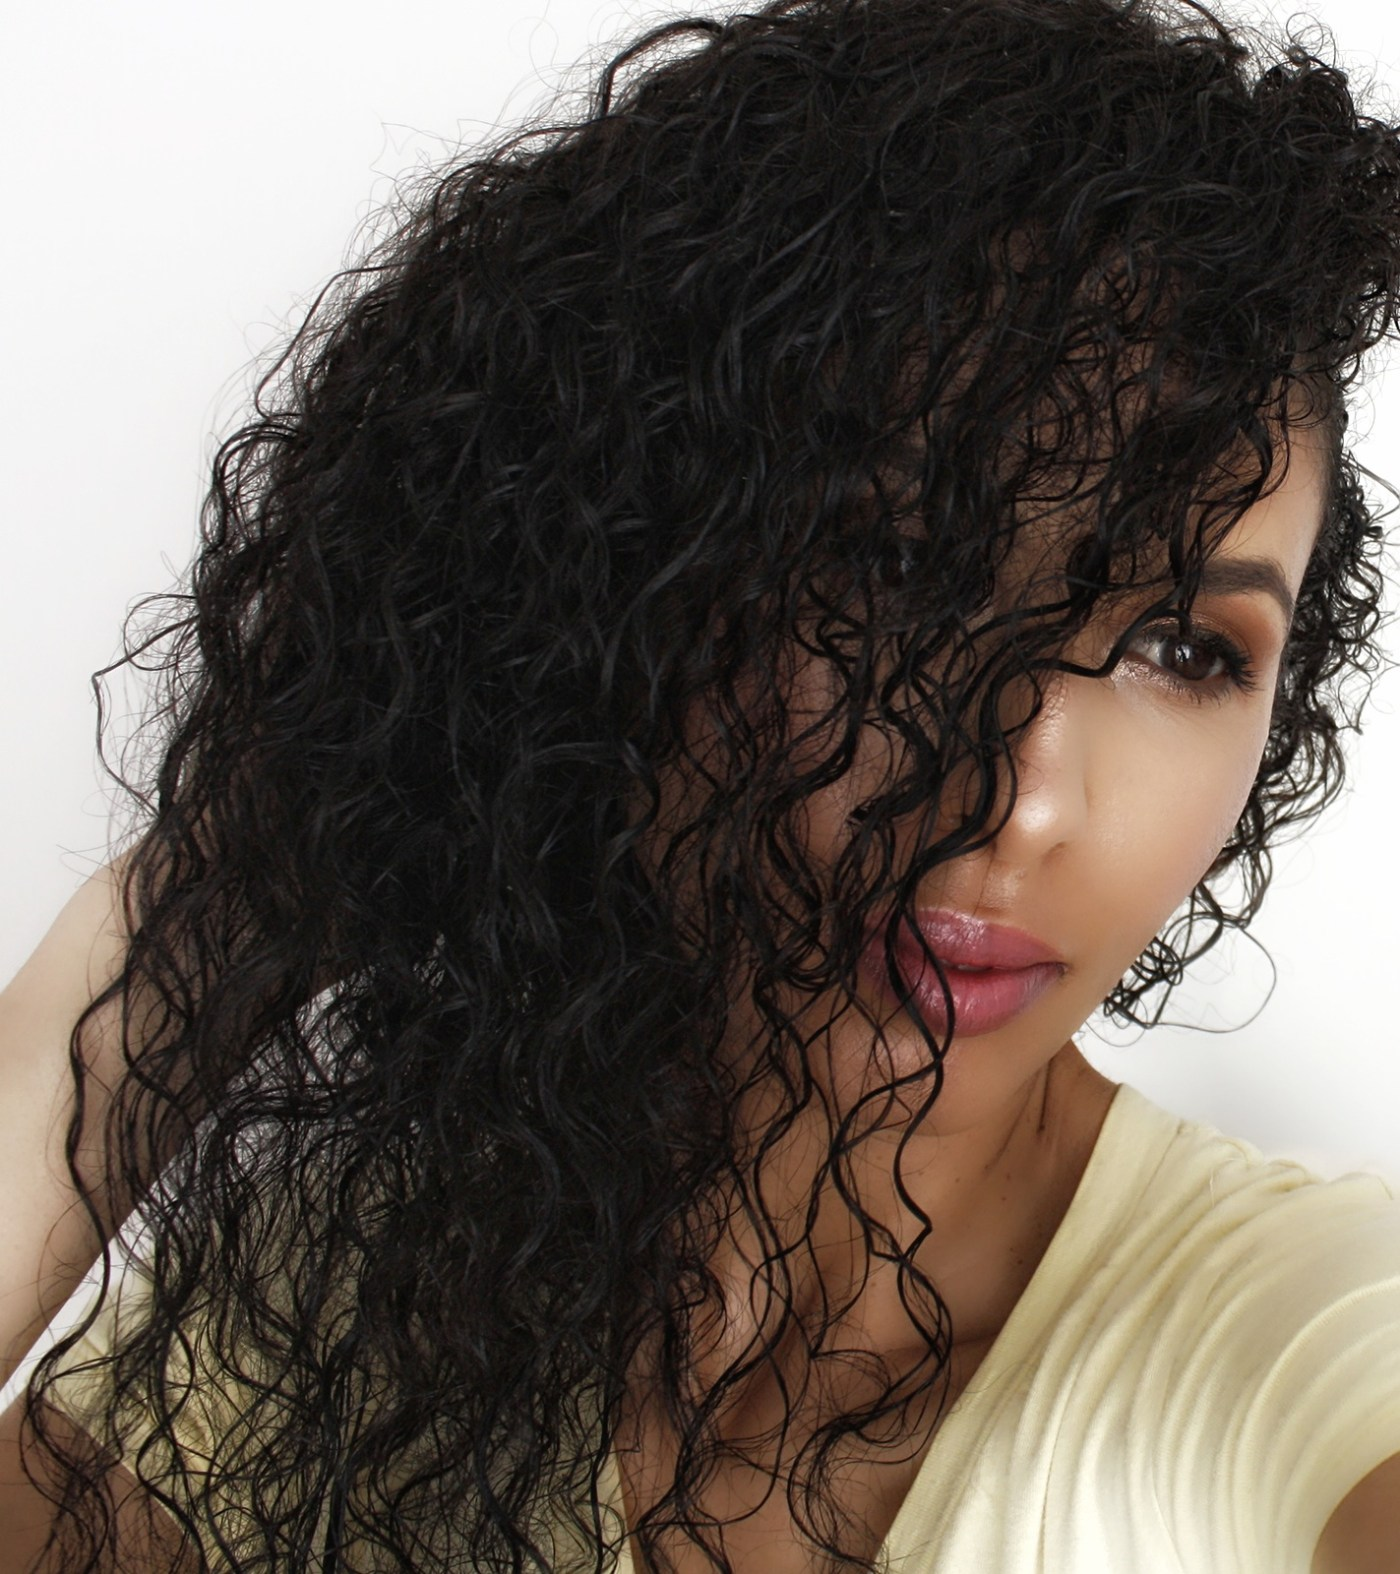 3 diy hair masks for natural hair - face to curls